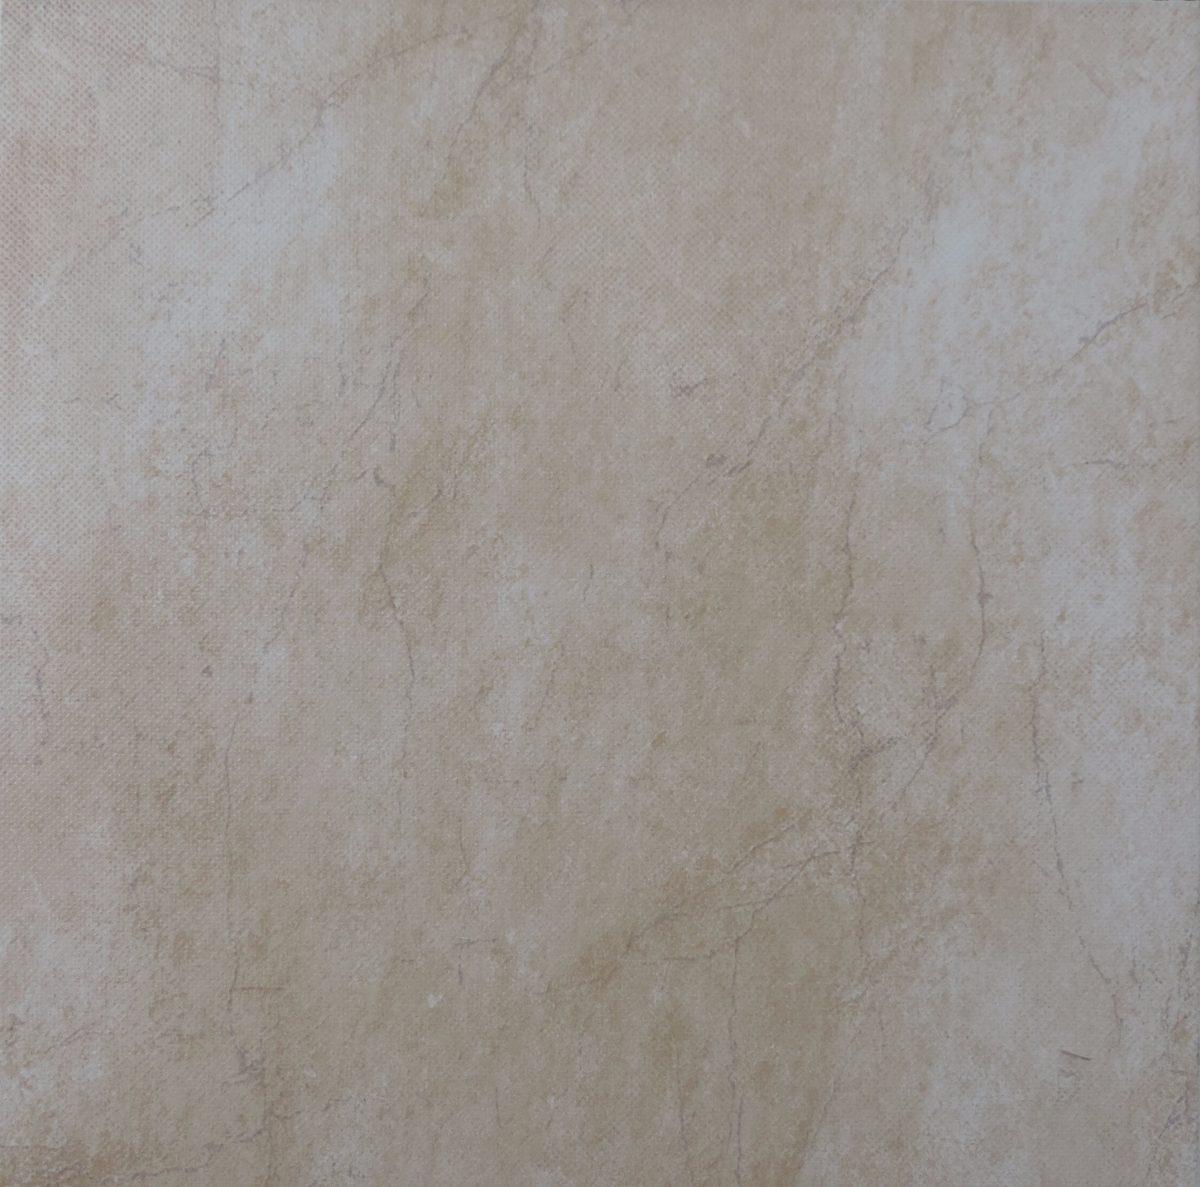 Ceramica piso antideslizante primera ceramicasuy 249 - Piso vinilico antideslizante ...